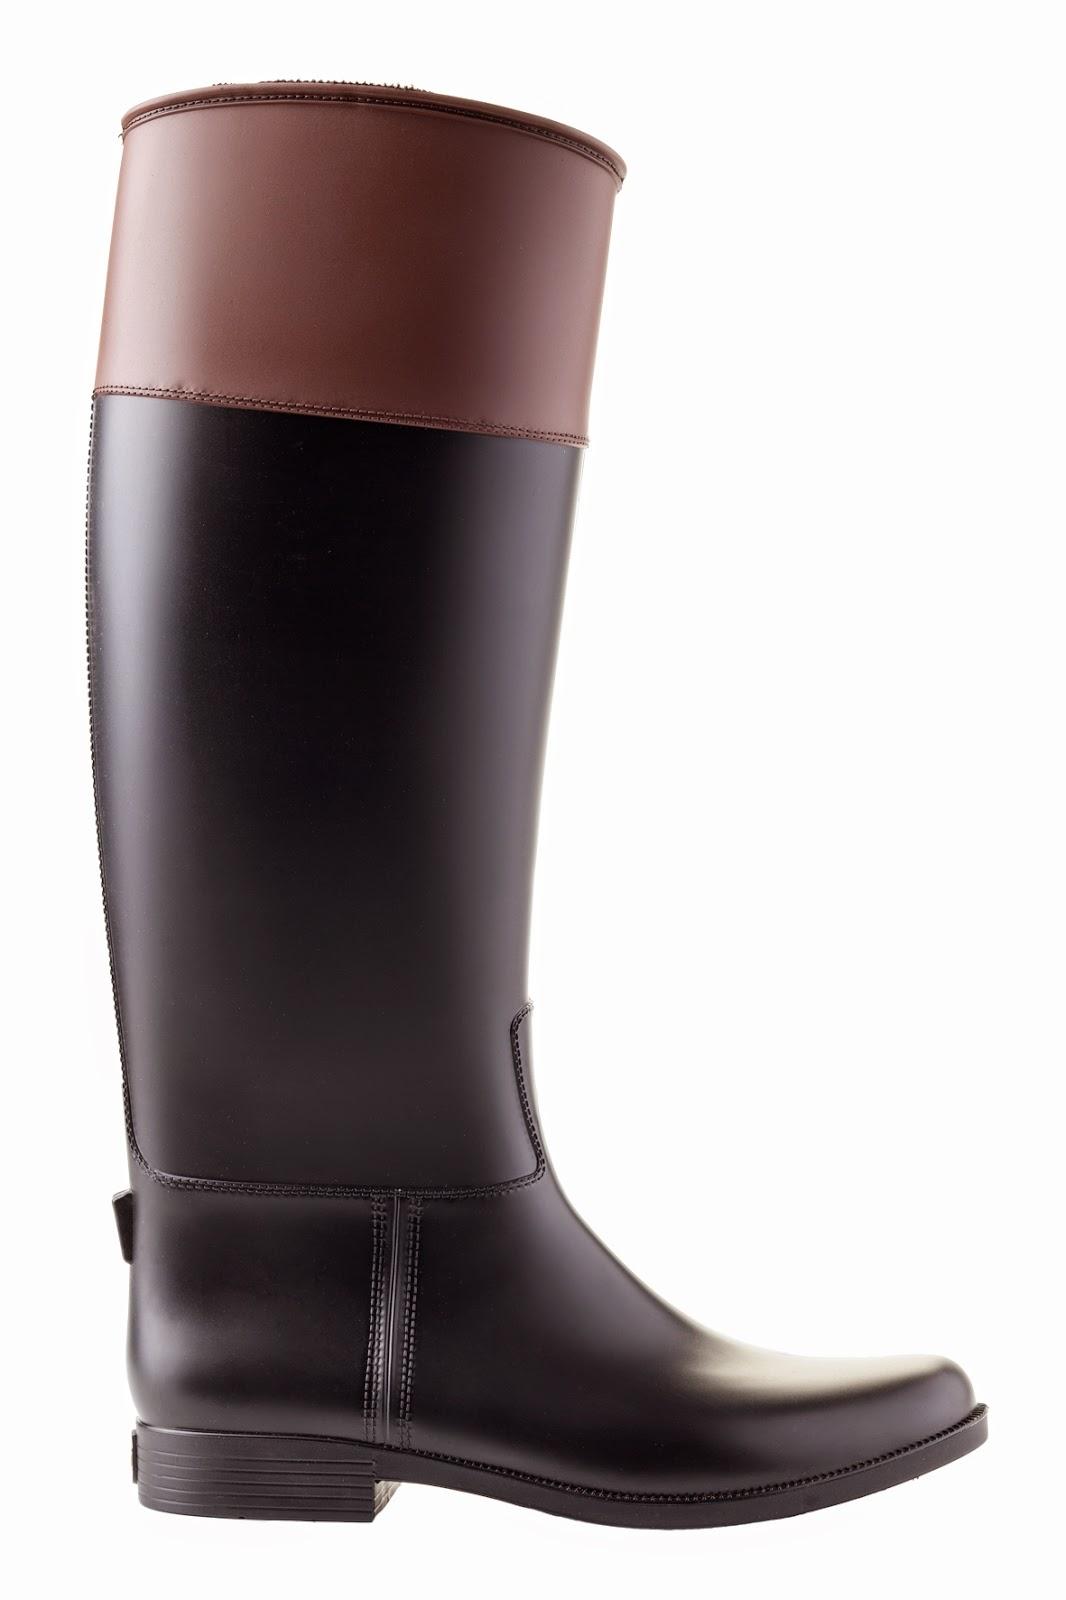 Igor-katiuskas-wellington-elblogdepatricia-shoes-calzado-scarpe-calzature